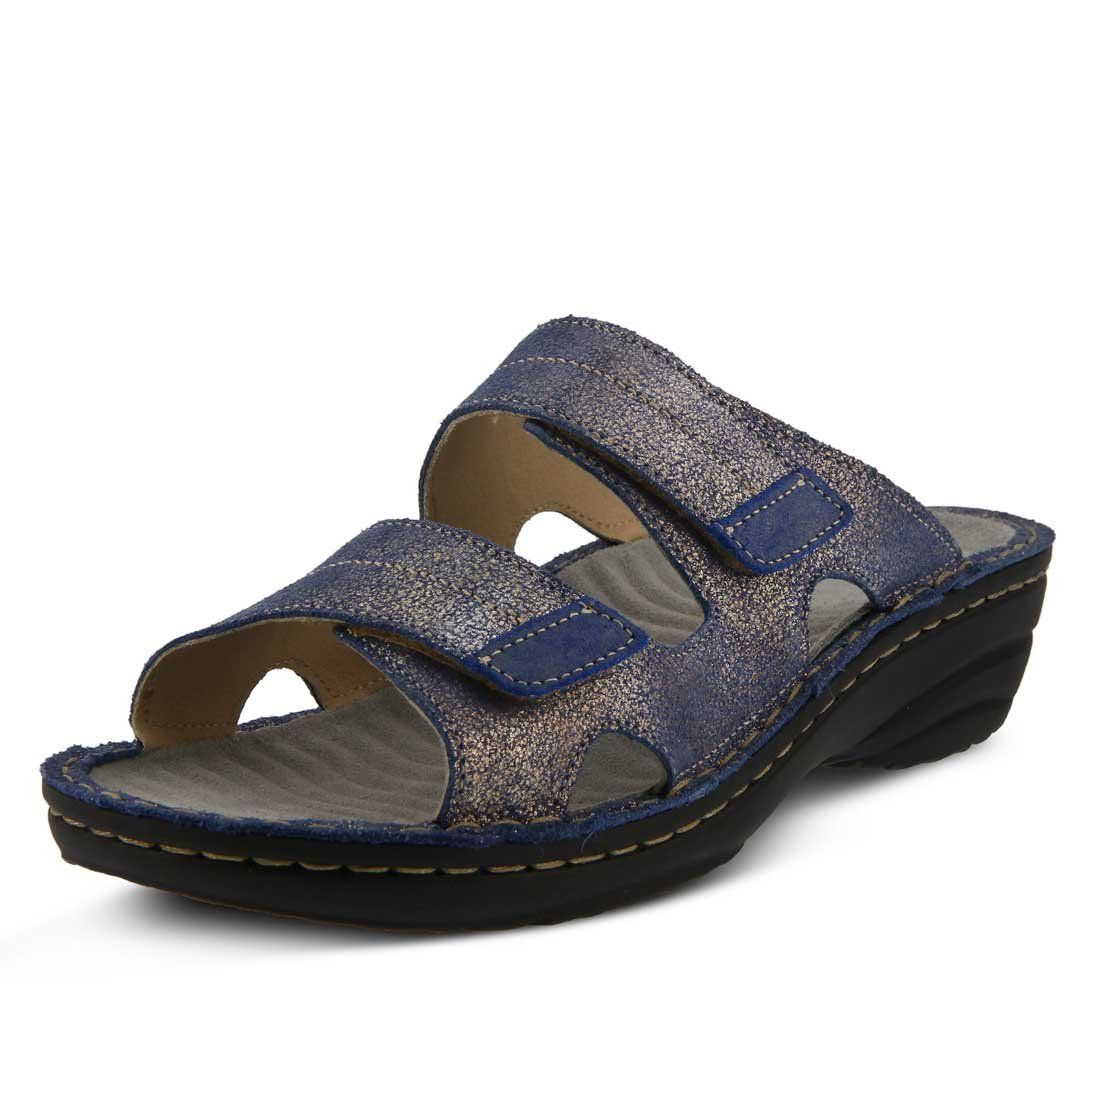 Spring Step Women's Marsela Flat Sandal, ** Sincerely hope